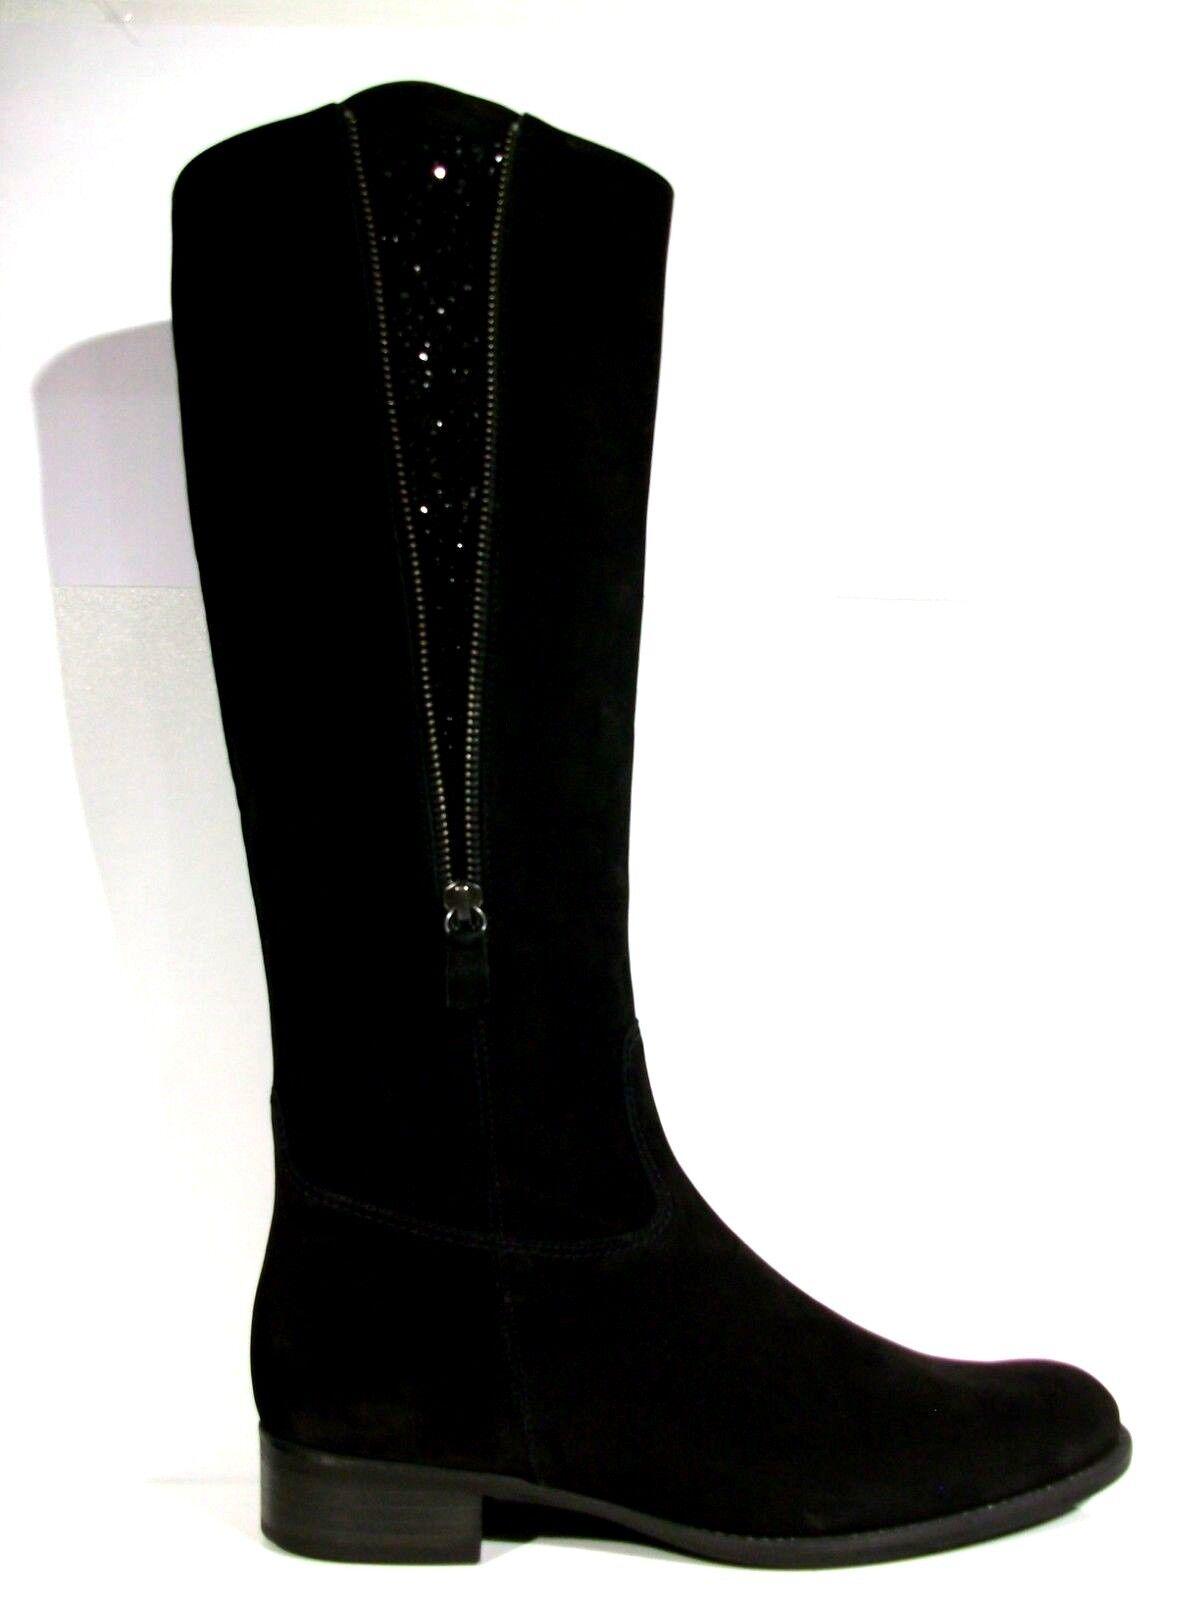 GABOR STIEFEL DAMEN Boots Gr. UK 5 (DE 38) Leder schwarz